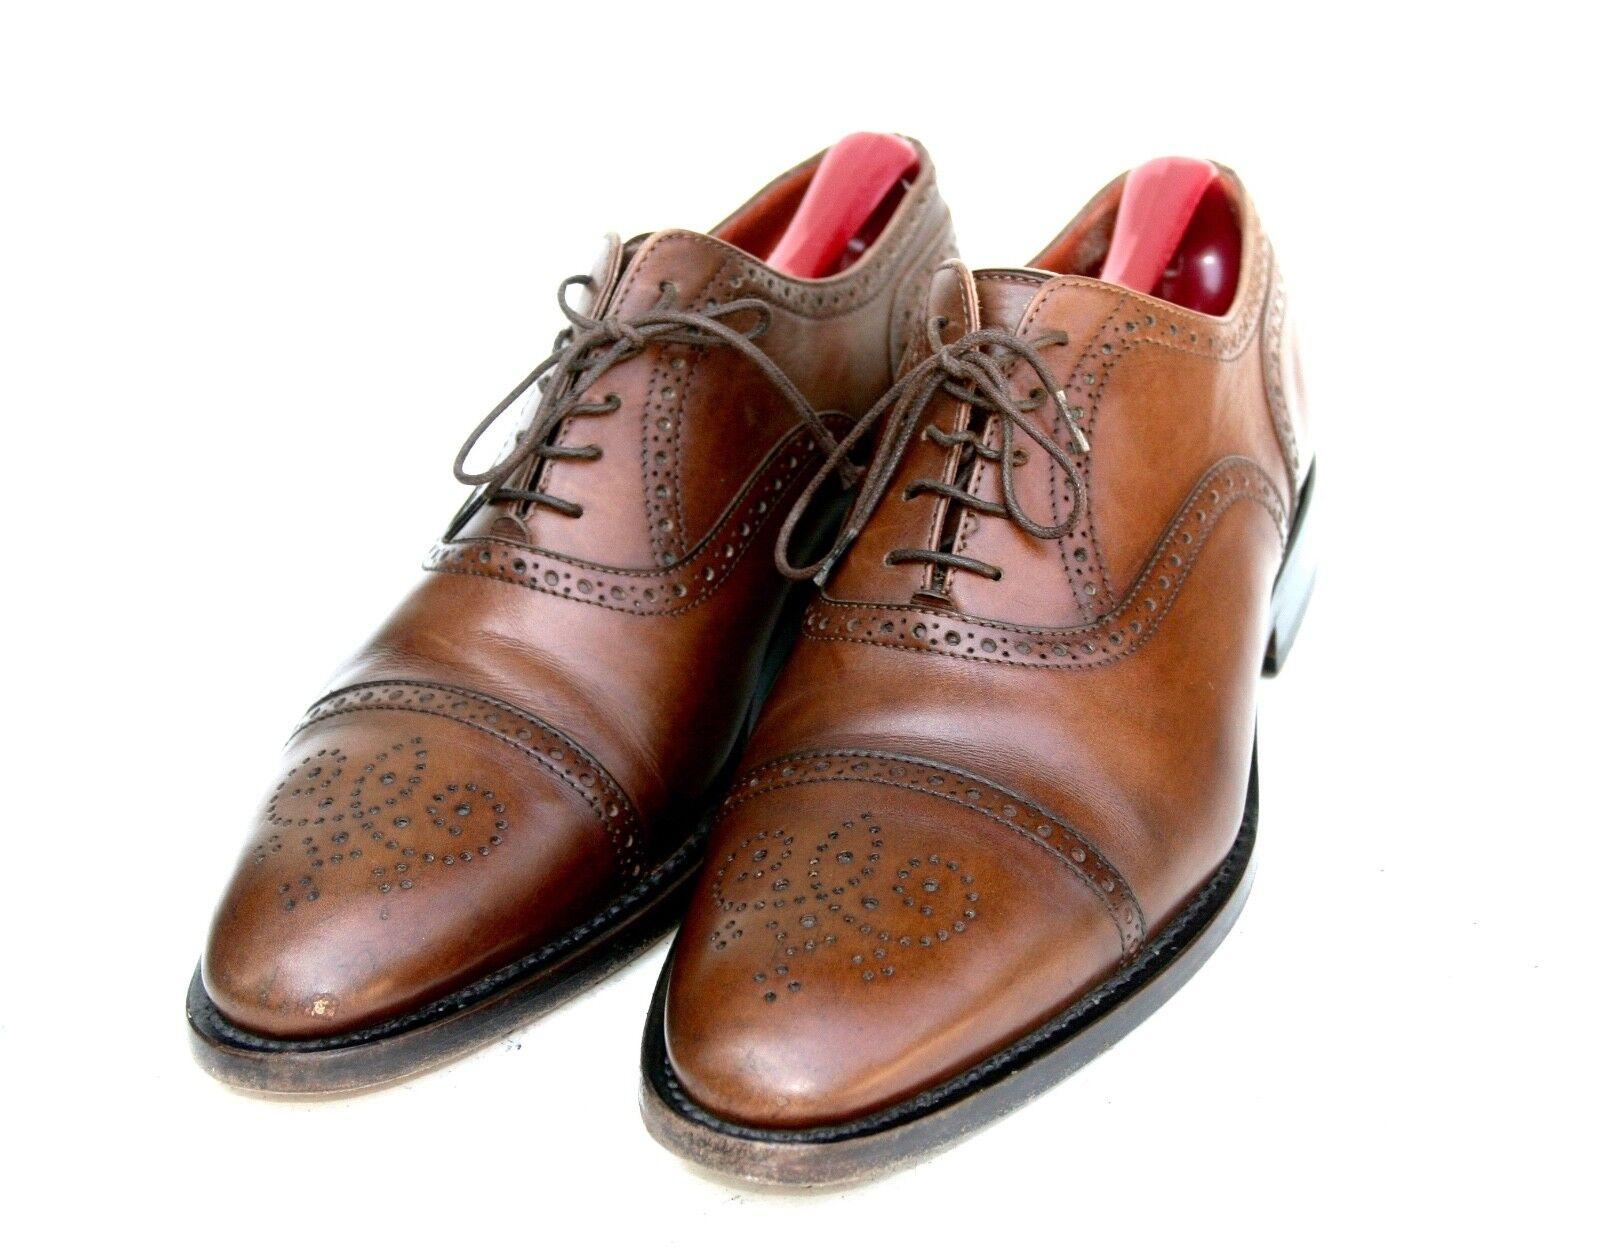 Giano Misura Italia Blake Rapid Marrón Toe Cuero Cap Toe Marrón Oxford Vestido Zapato 8  US 8.5 606967